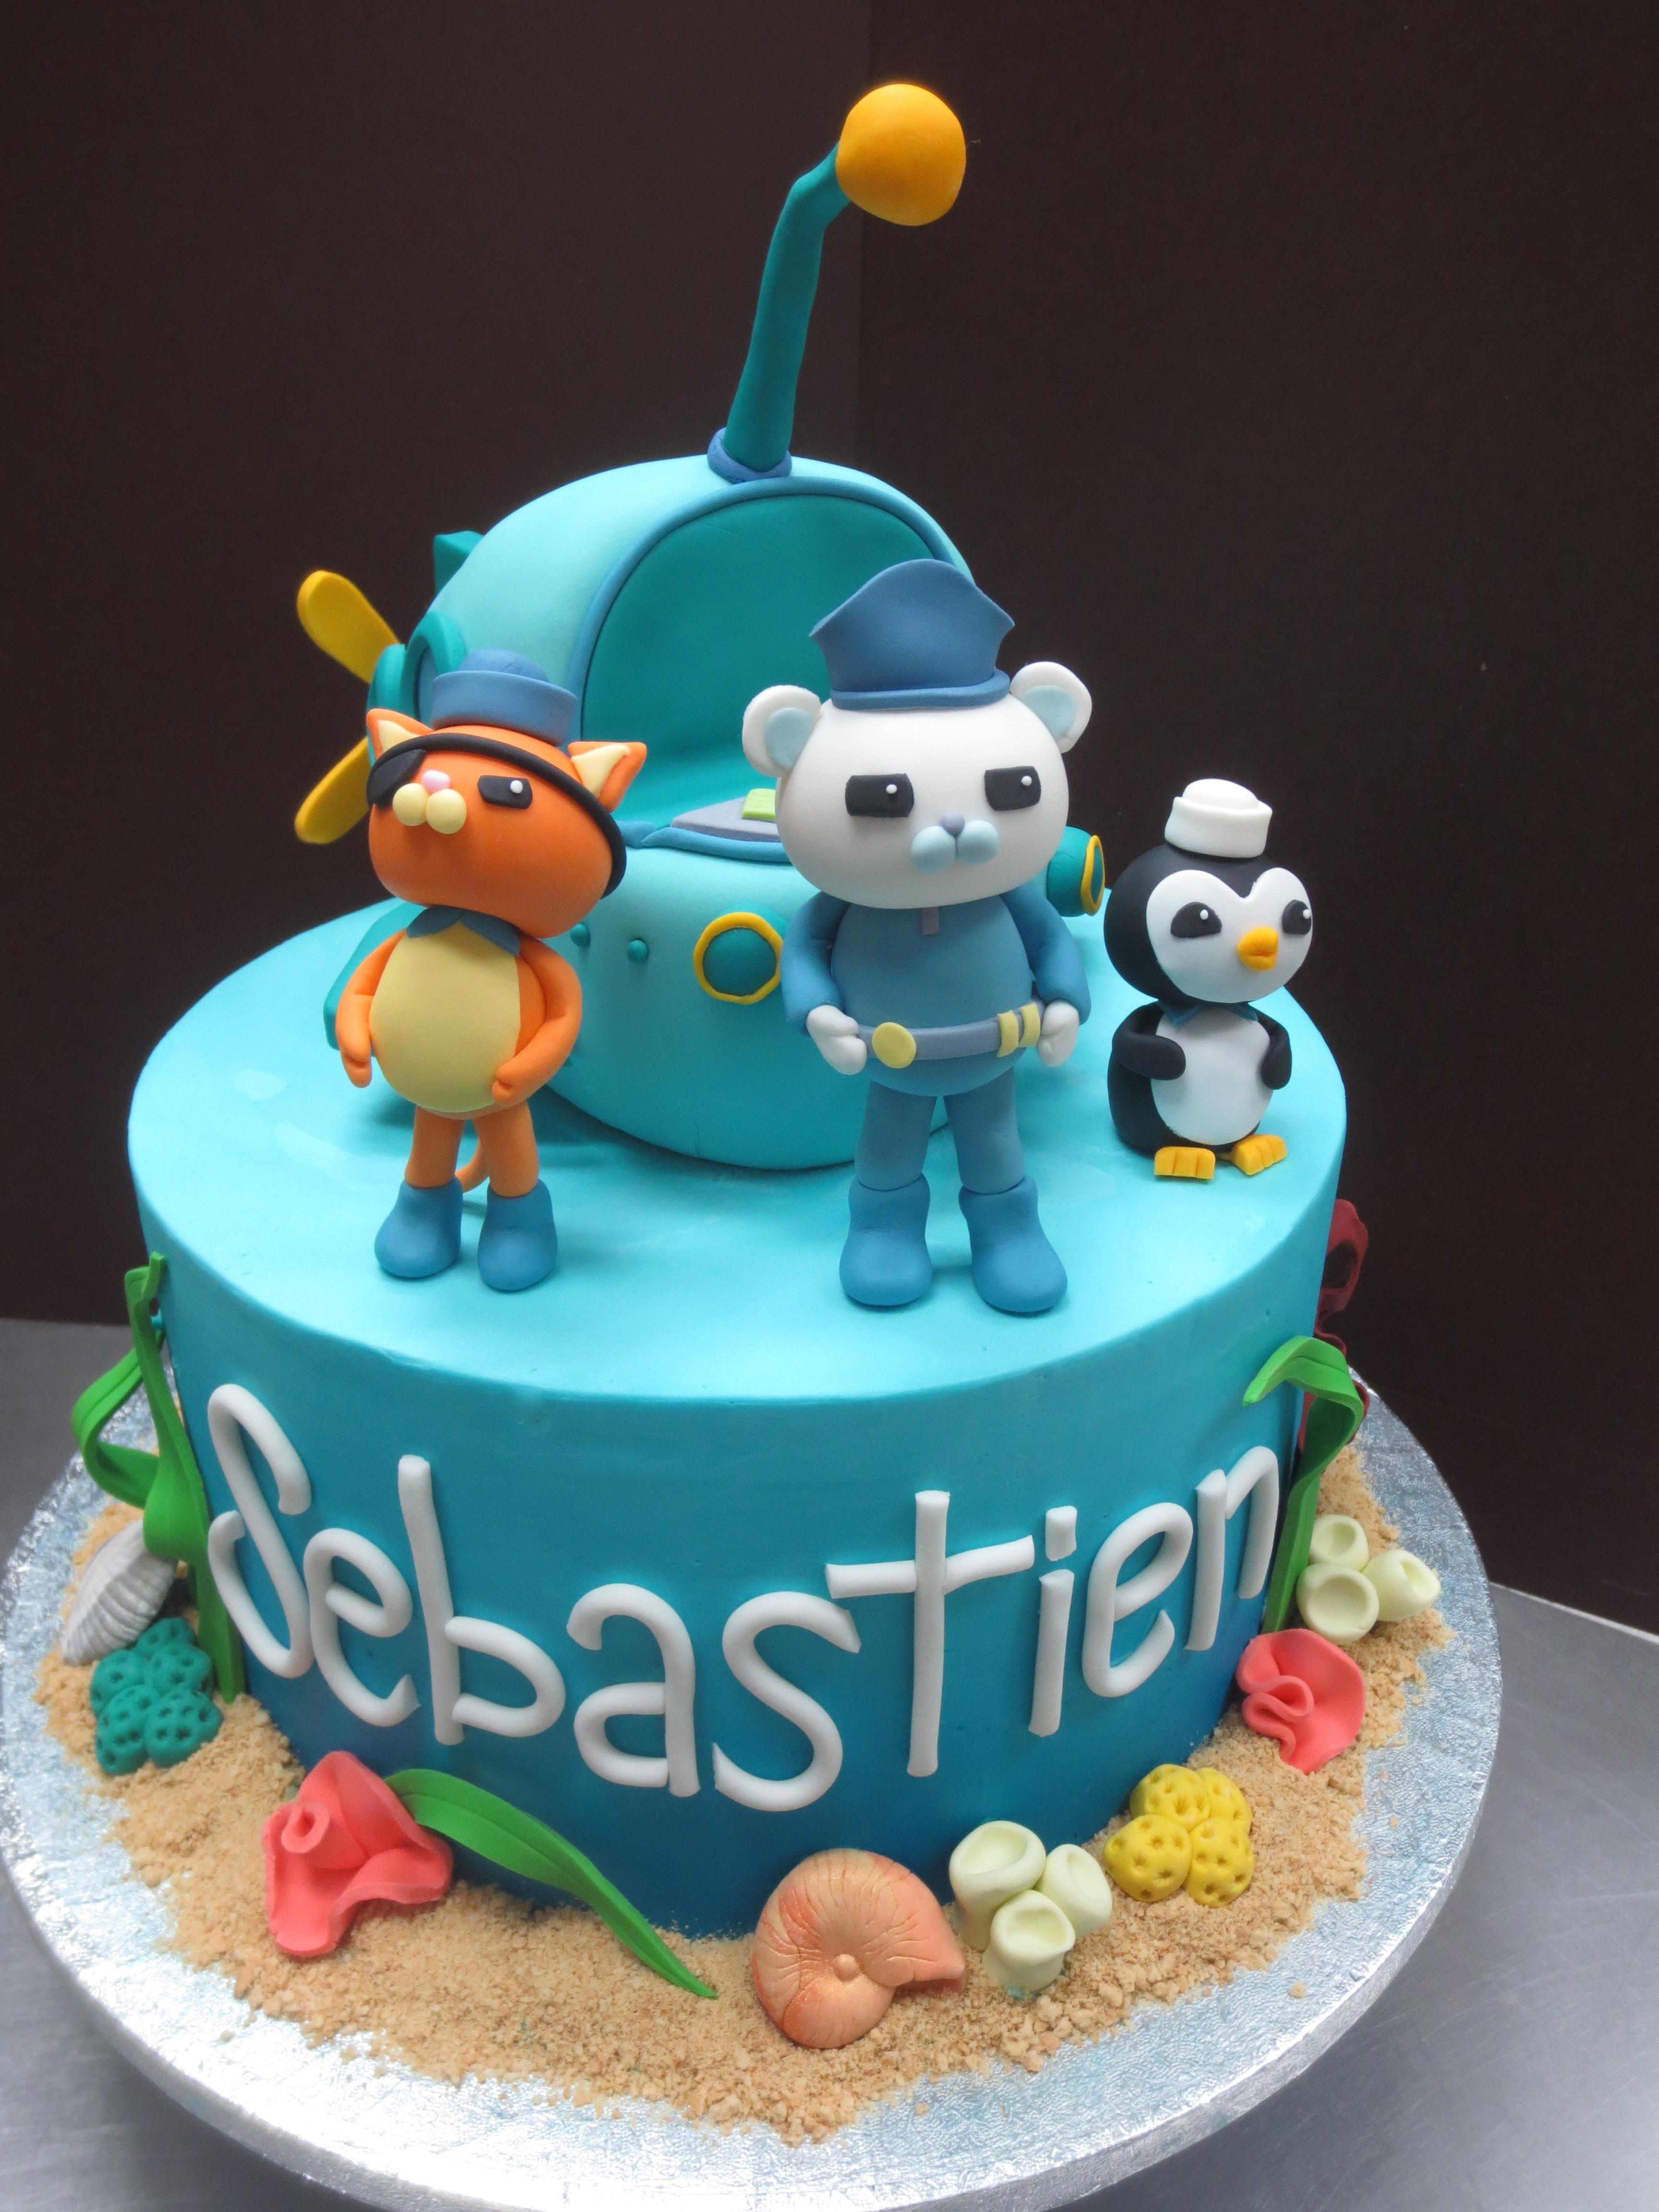 Octonauts Birthday Cake With Fondant Sea Life